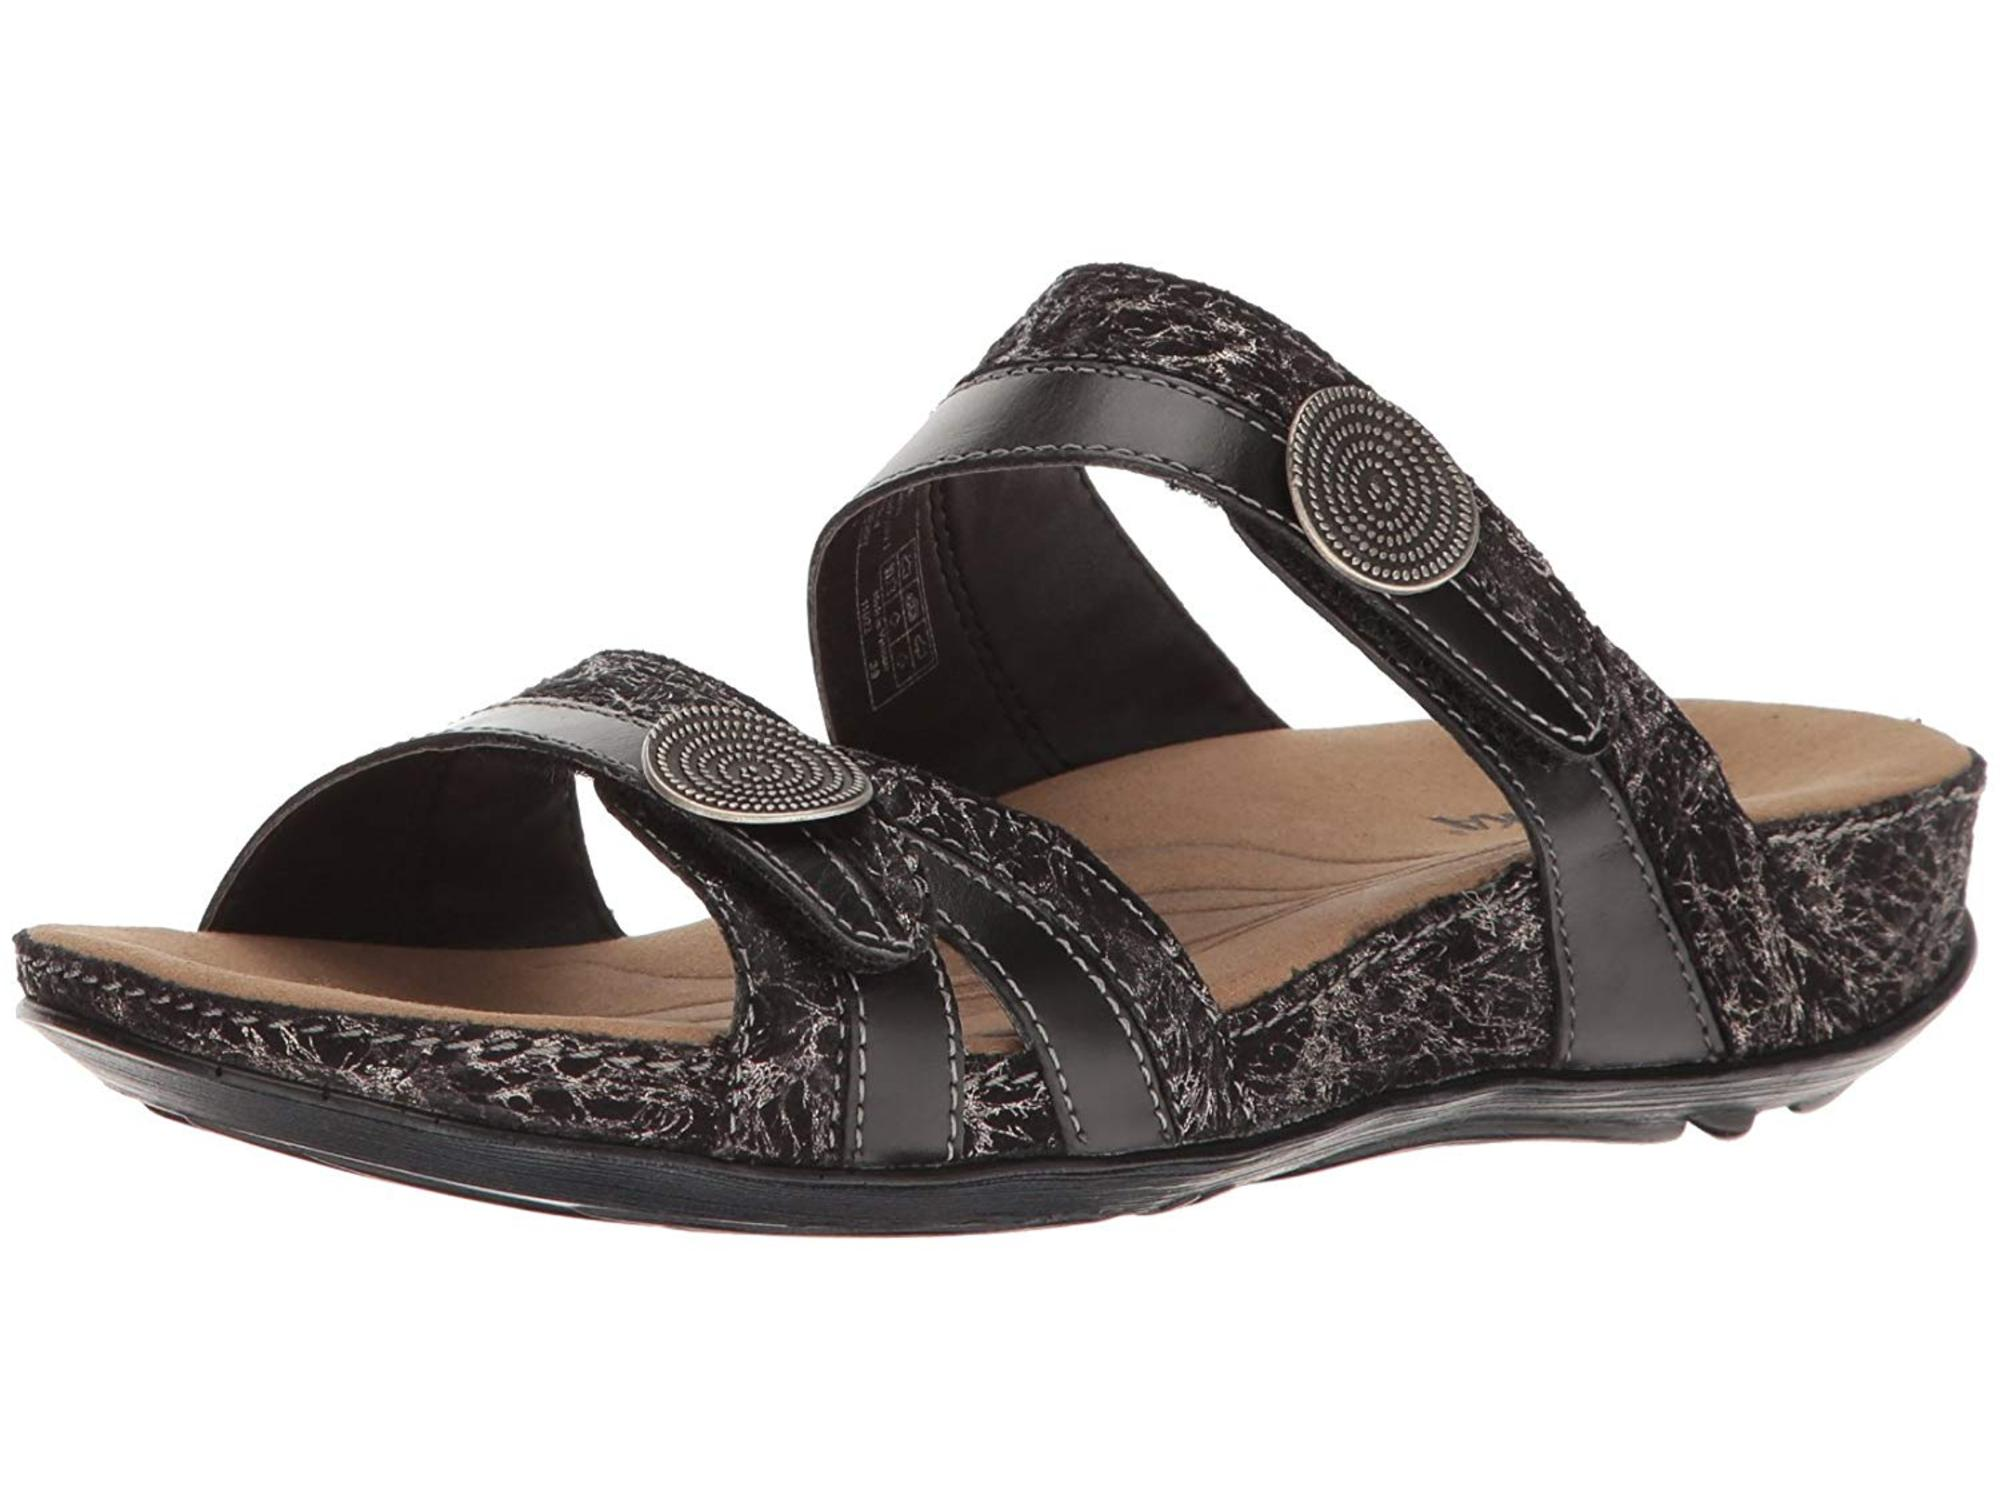 b2f5c06b9445 Romika Womens Fidschi 22 Leather Open Toe Casual Slide